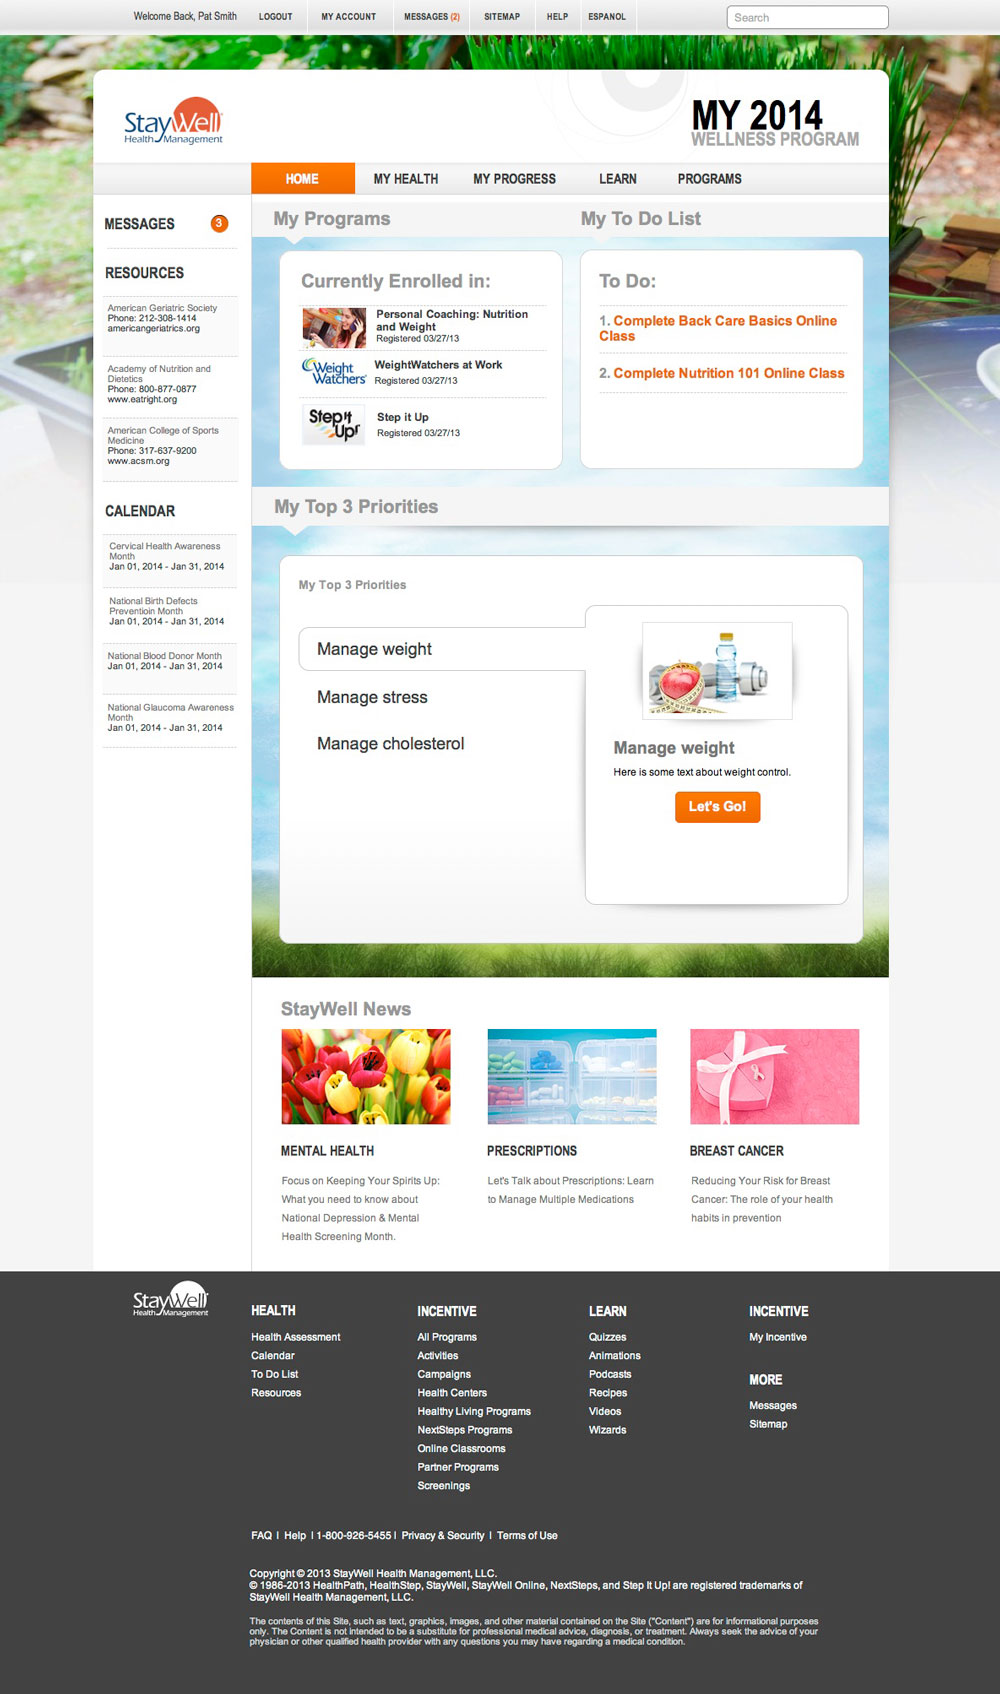 Return_Dashboard.jpg